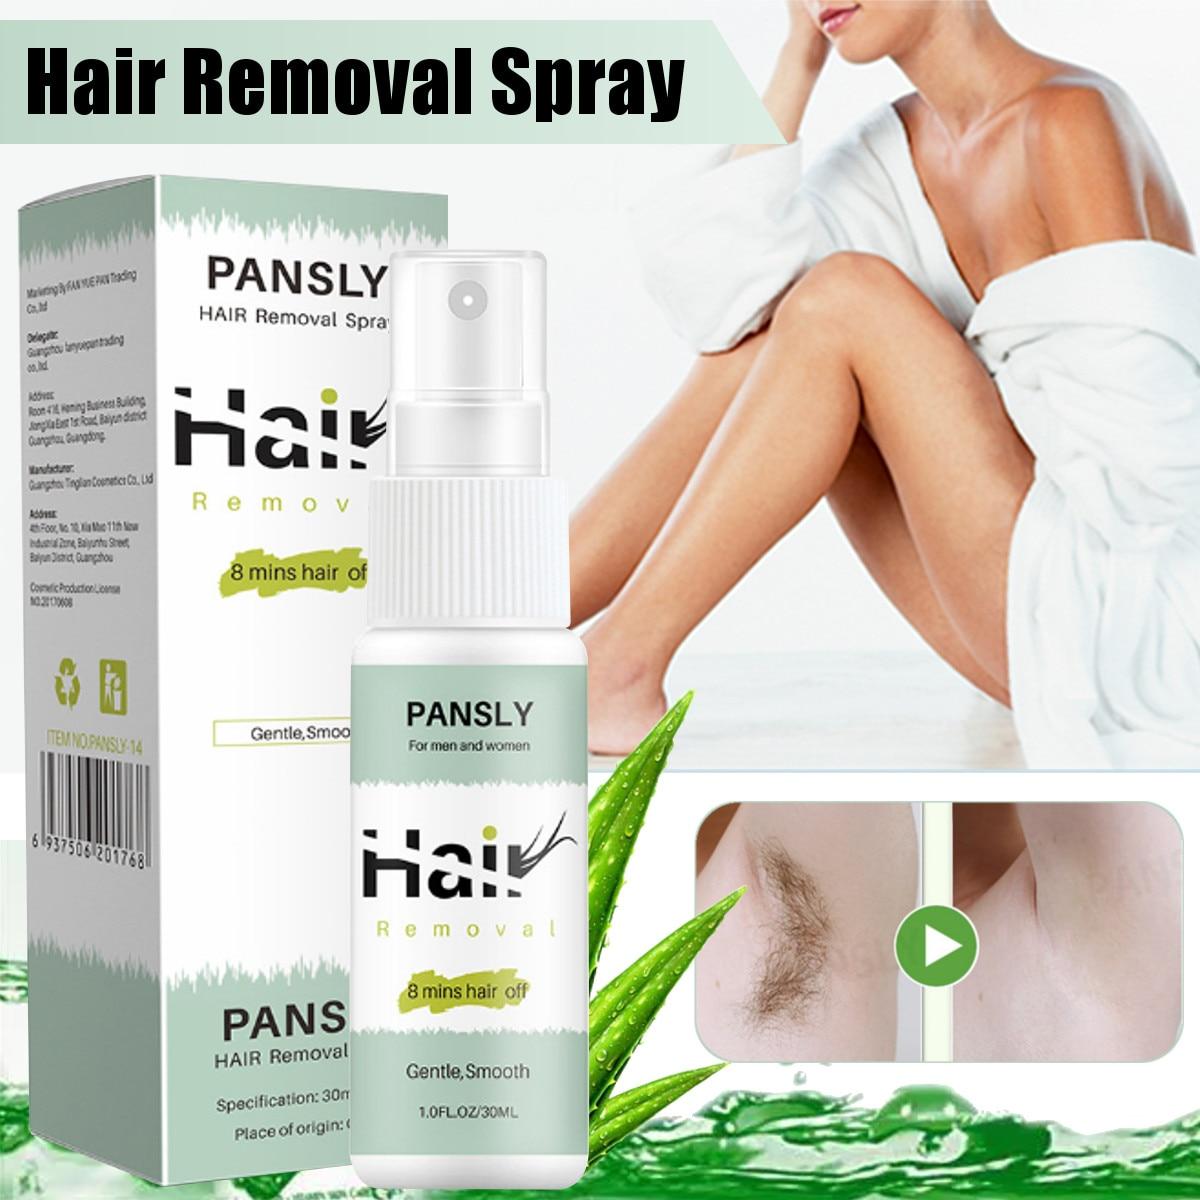 Pansly 8 Mins Off Hair Removal Cream Face Body Pubic Hair Depilatory Beard Bikini Legs Armpit Painless Hair Removal Spray